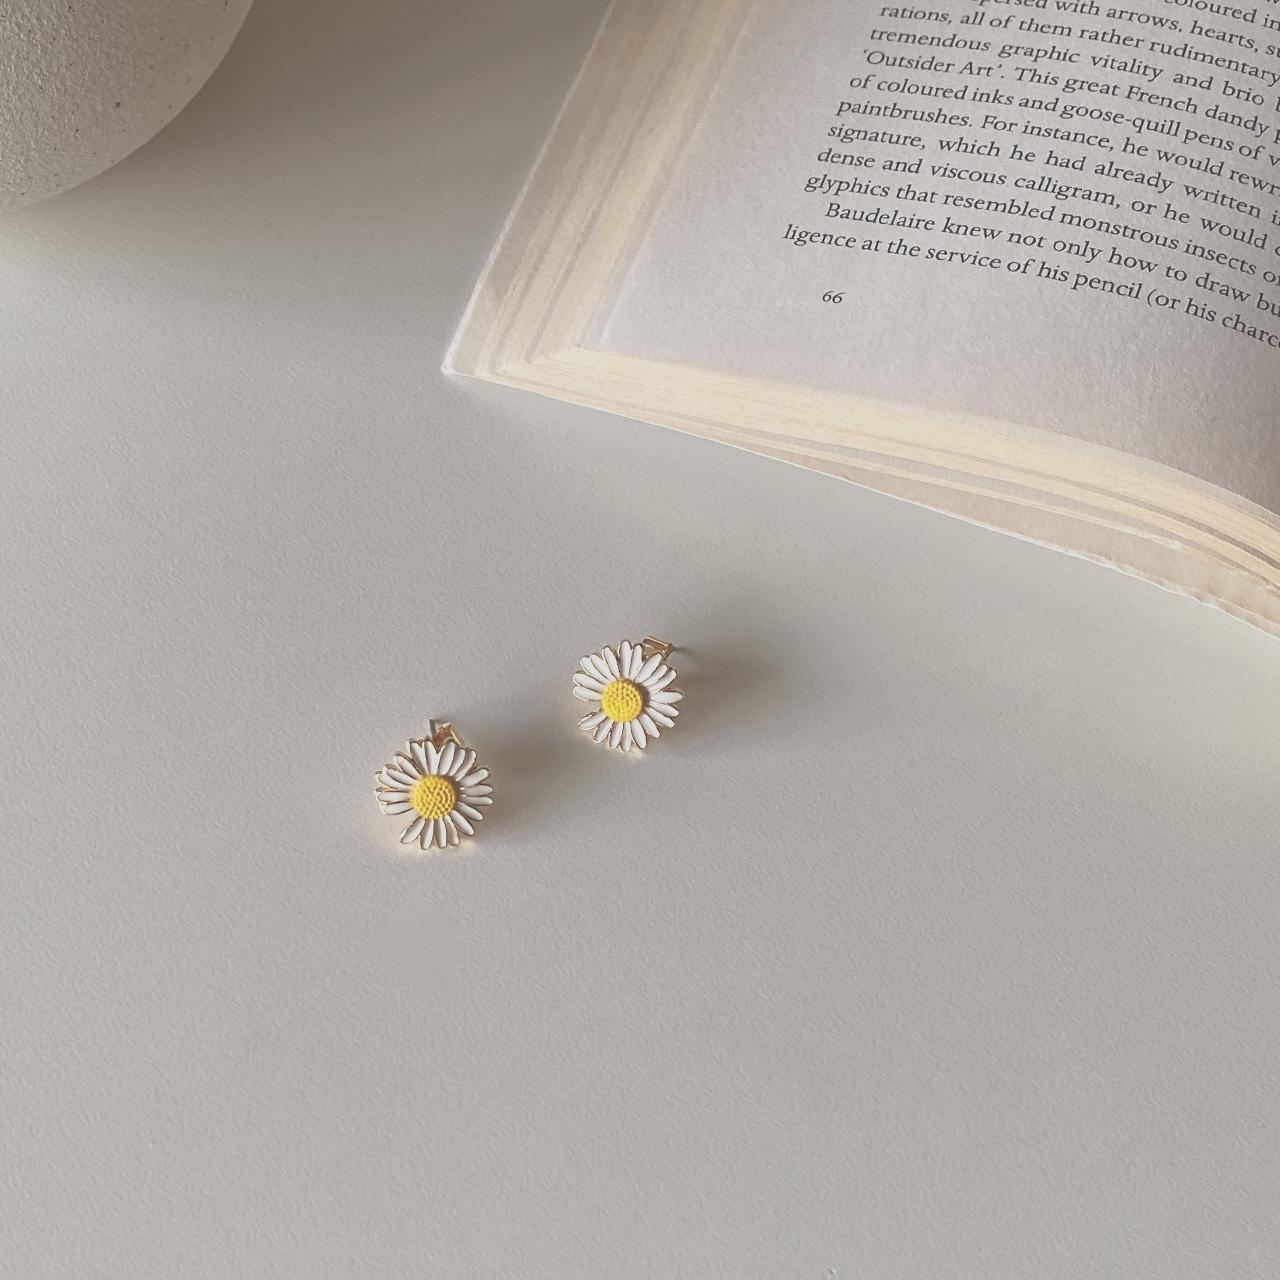 Daisy point pierce